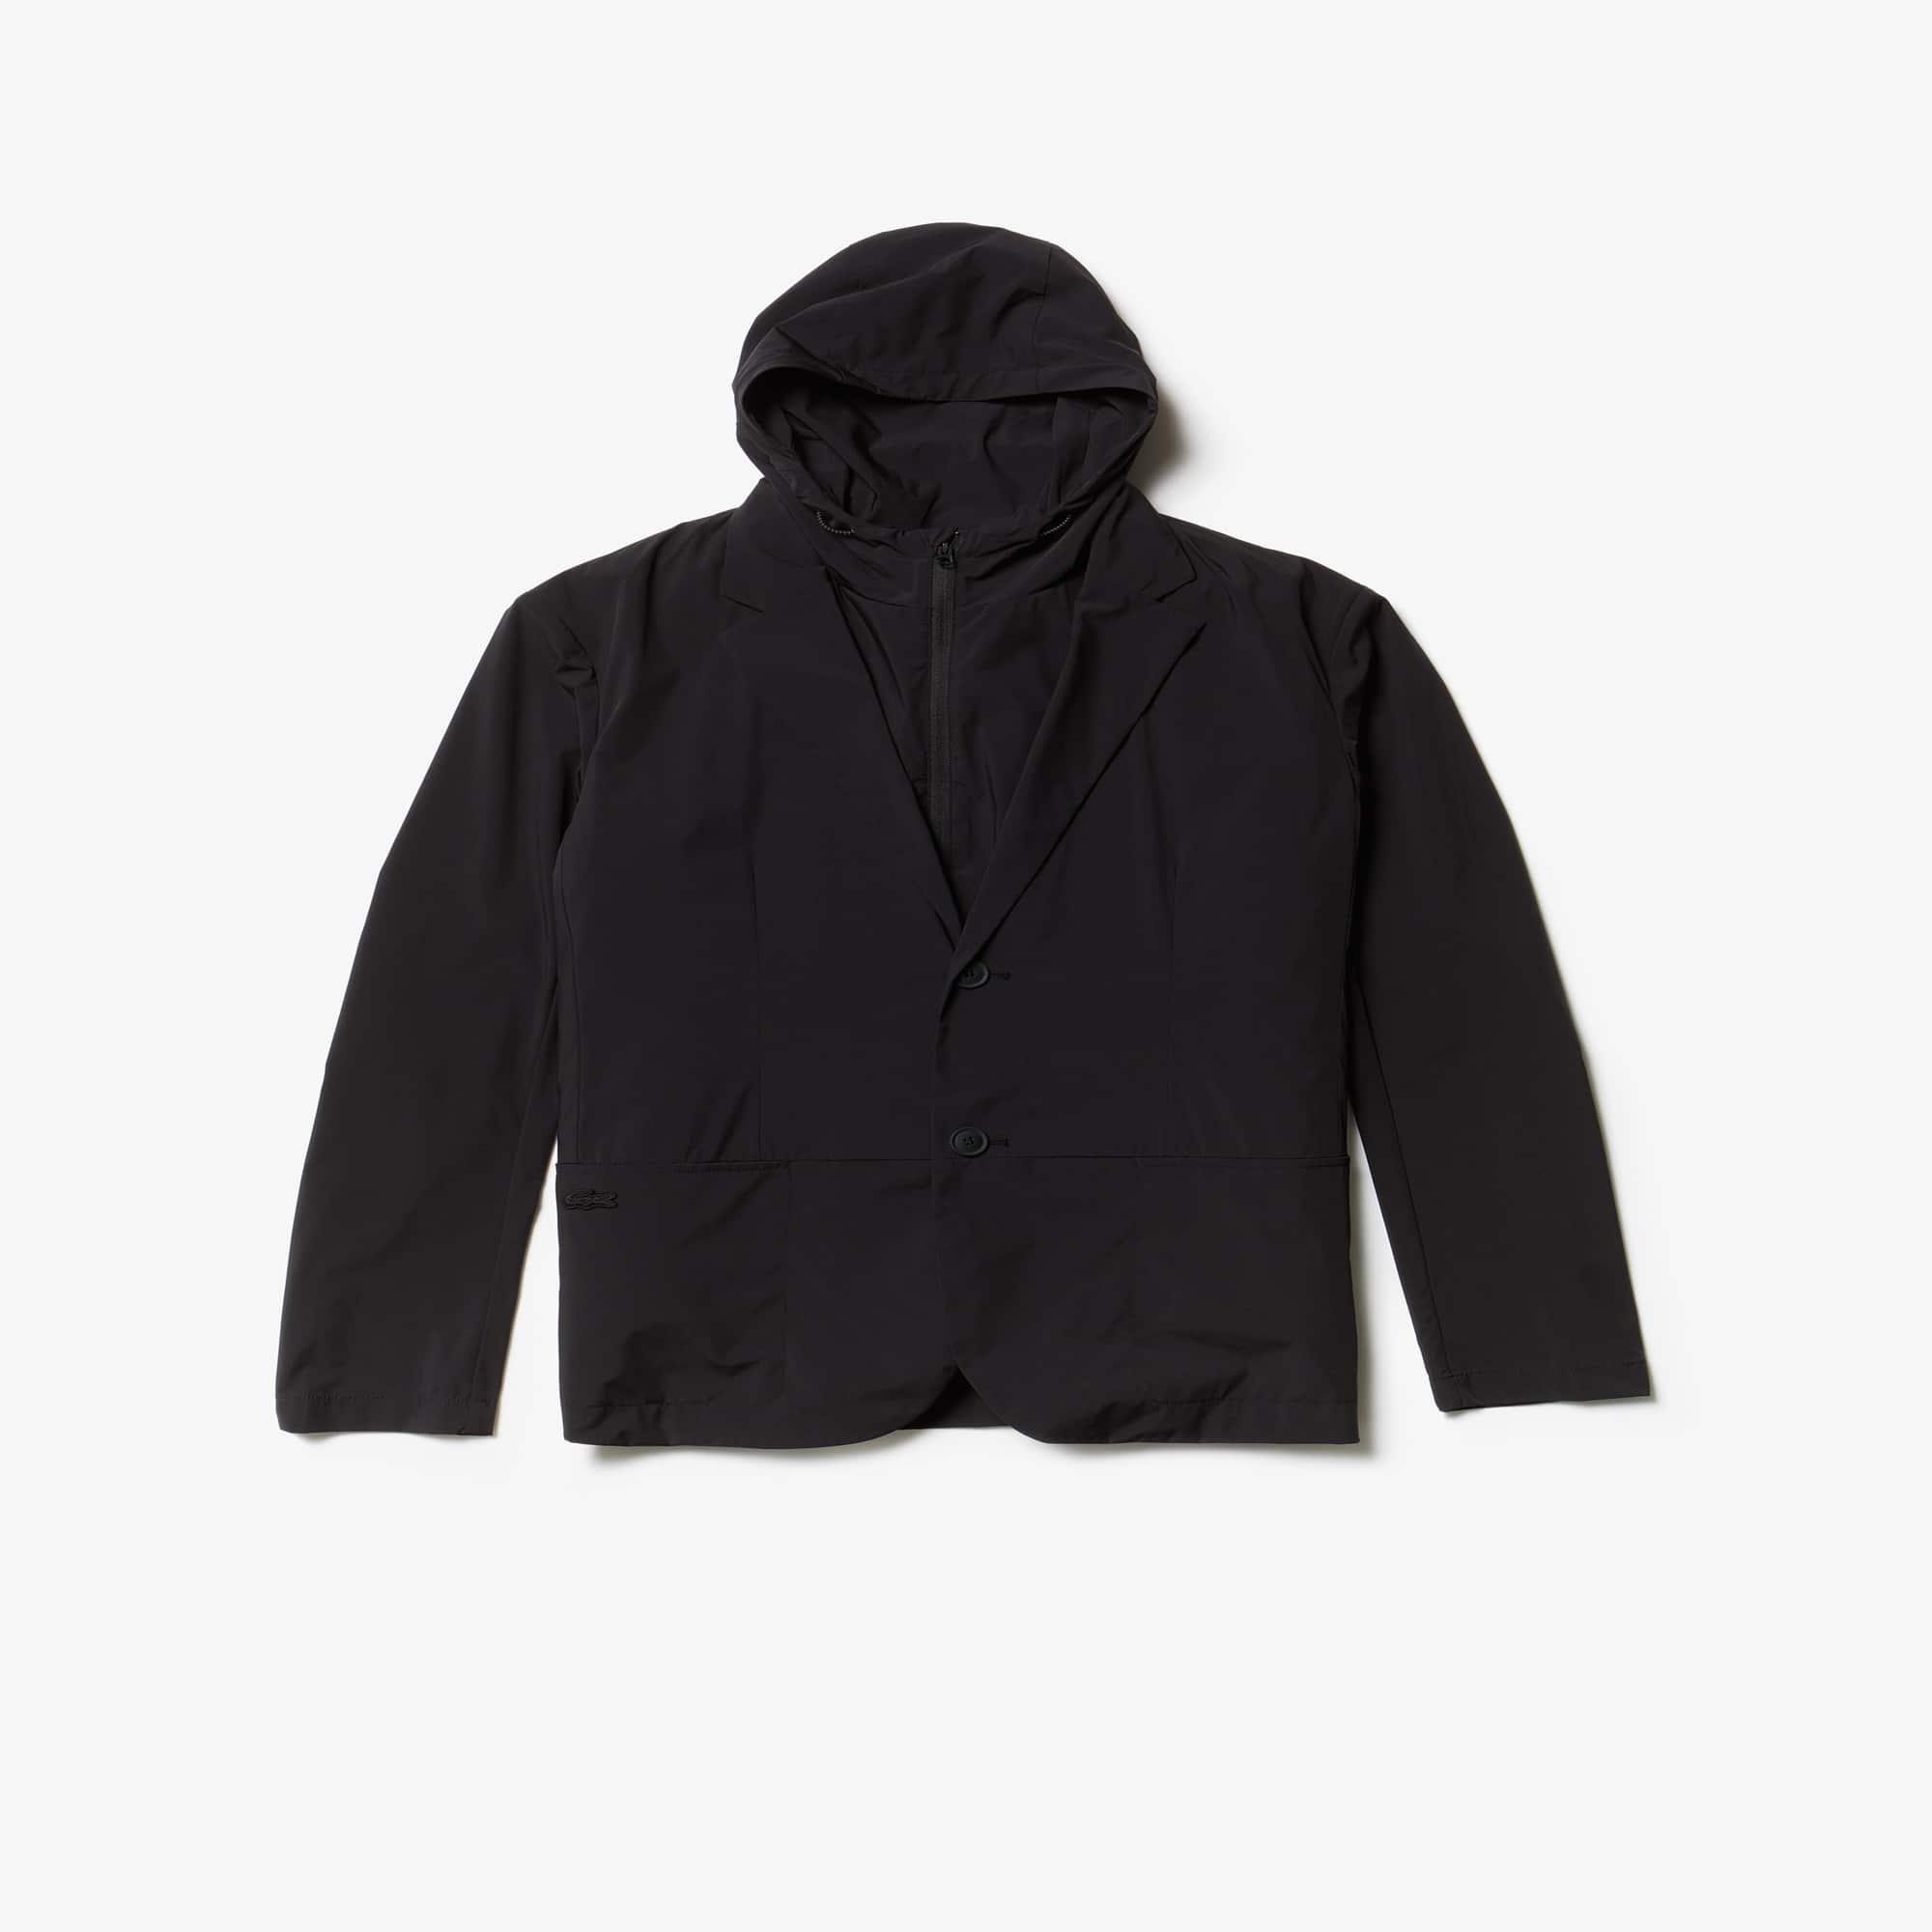 3076ebcb4052e4 Men s Jackets and Coats